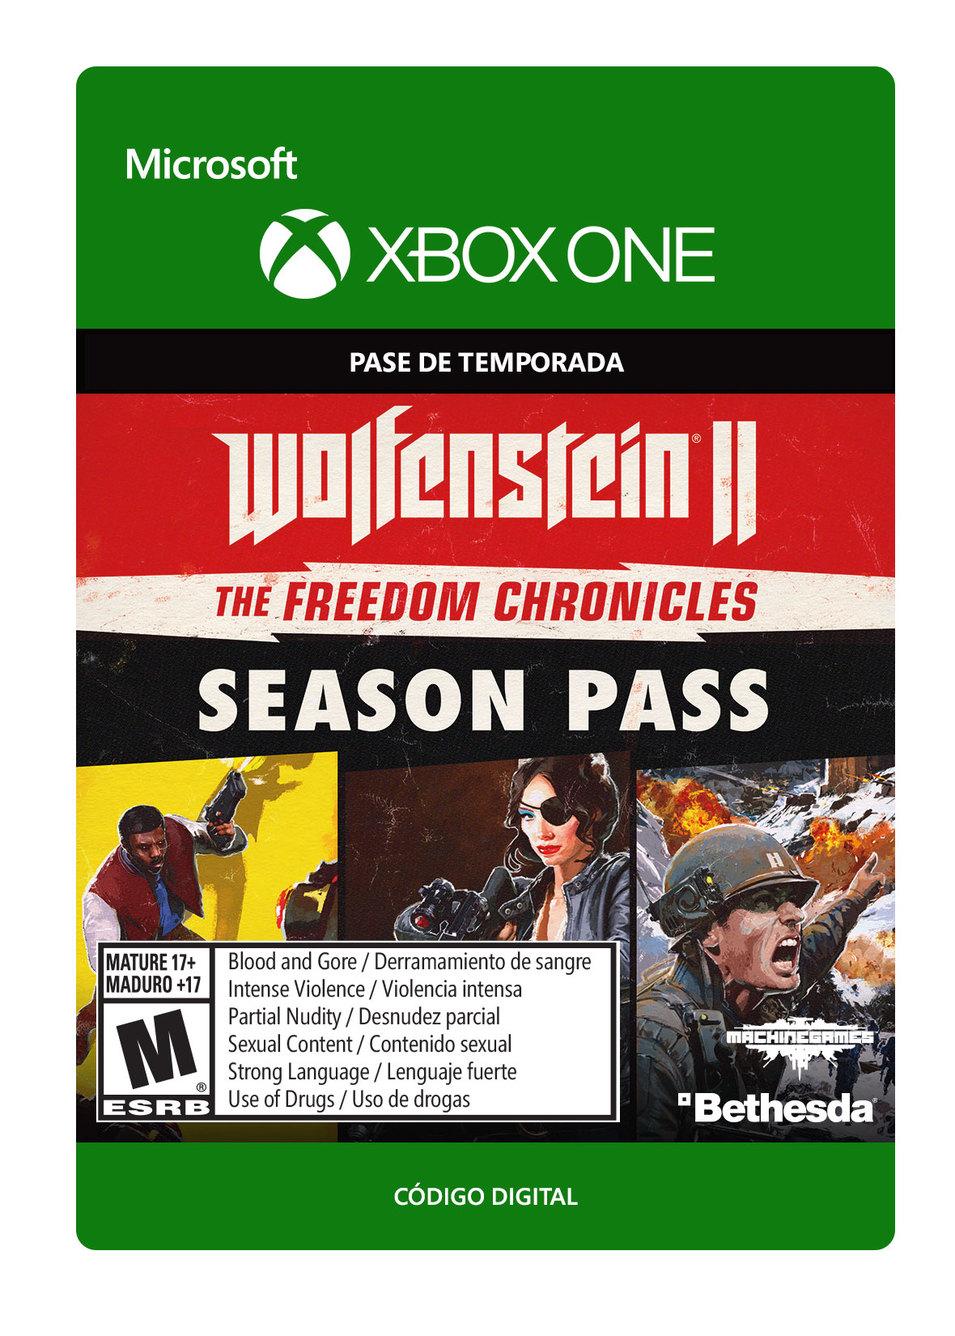 Wolfenstein II: Cronicas de libertad Season Pass